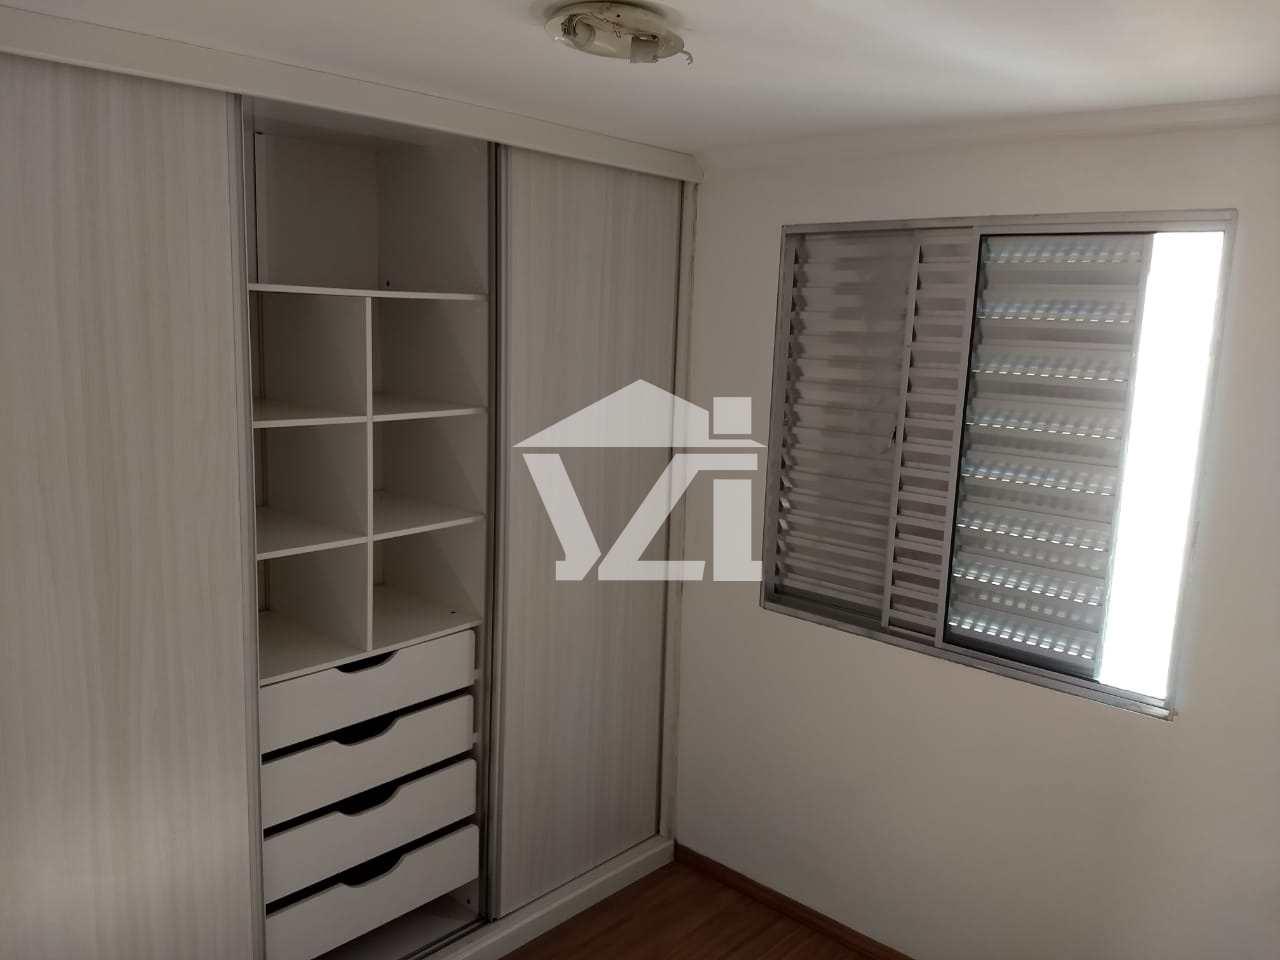 Apartamento com 2 dorms, Jardim Santa Teresa, Mogi das Cruzes - R$ 130 mil, Cod: 339